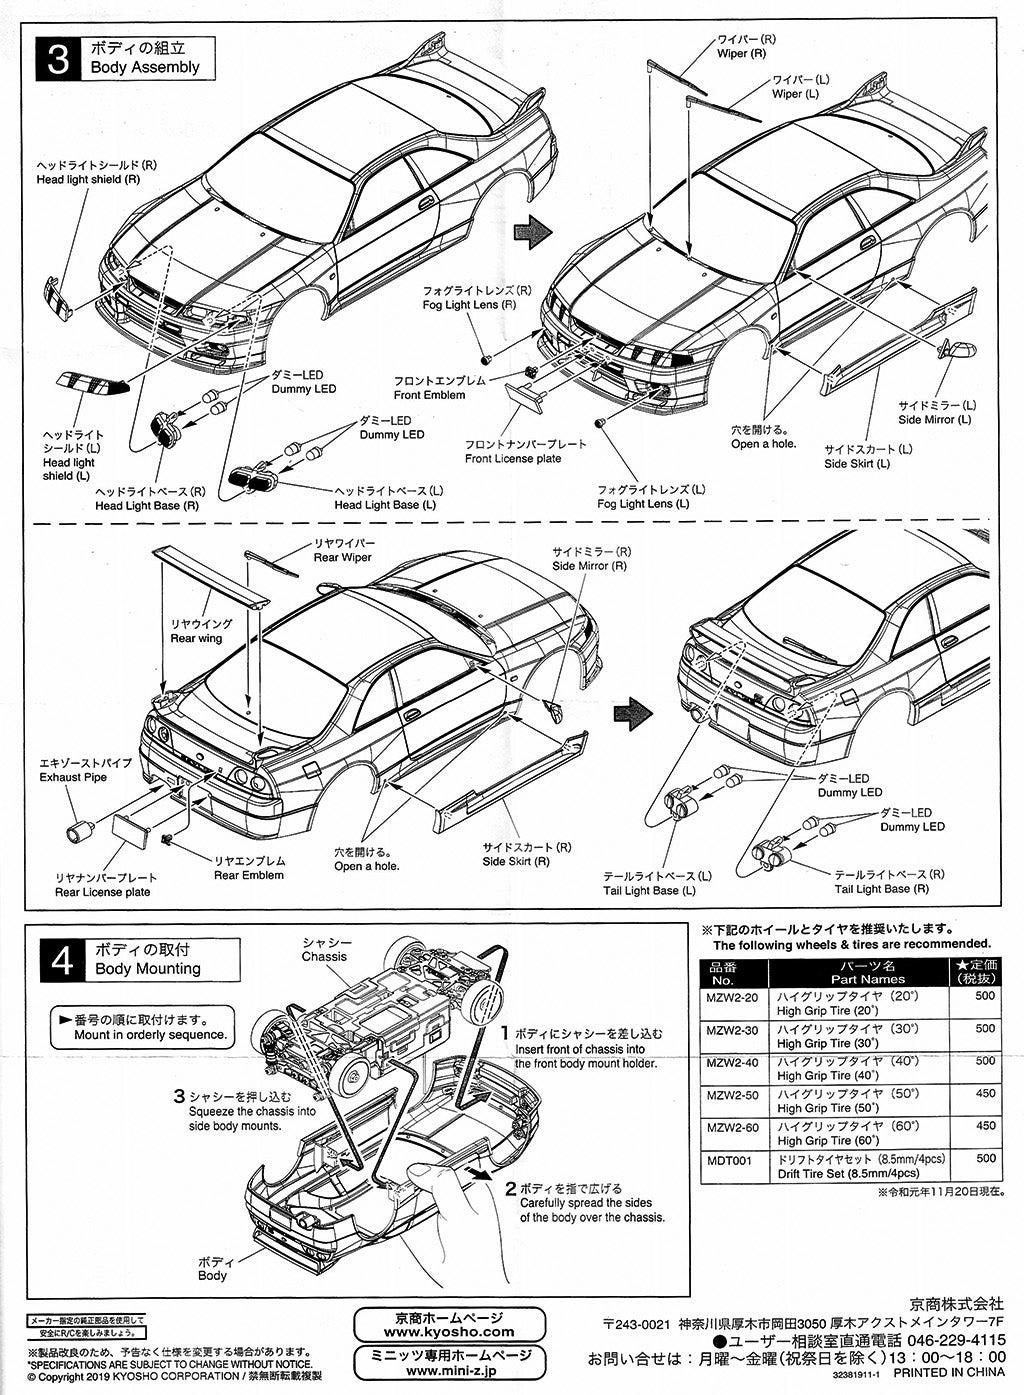 Mzn197 Nissan Gt R Nismo R33 White Body Set